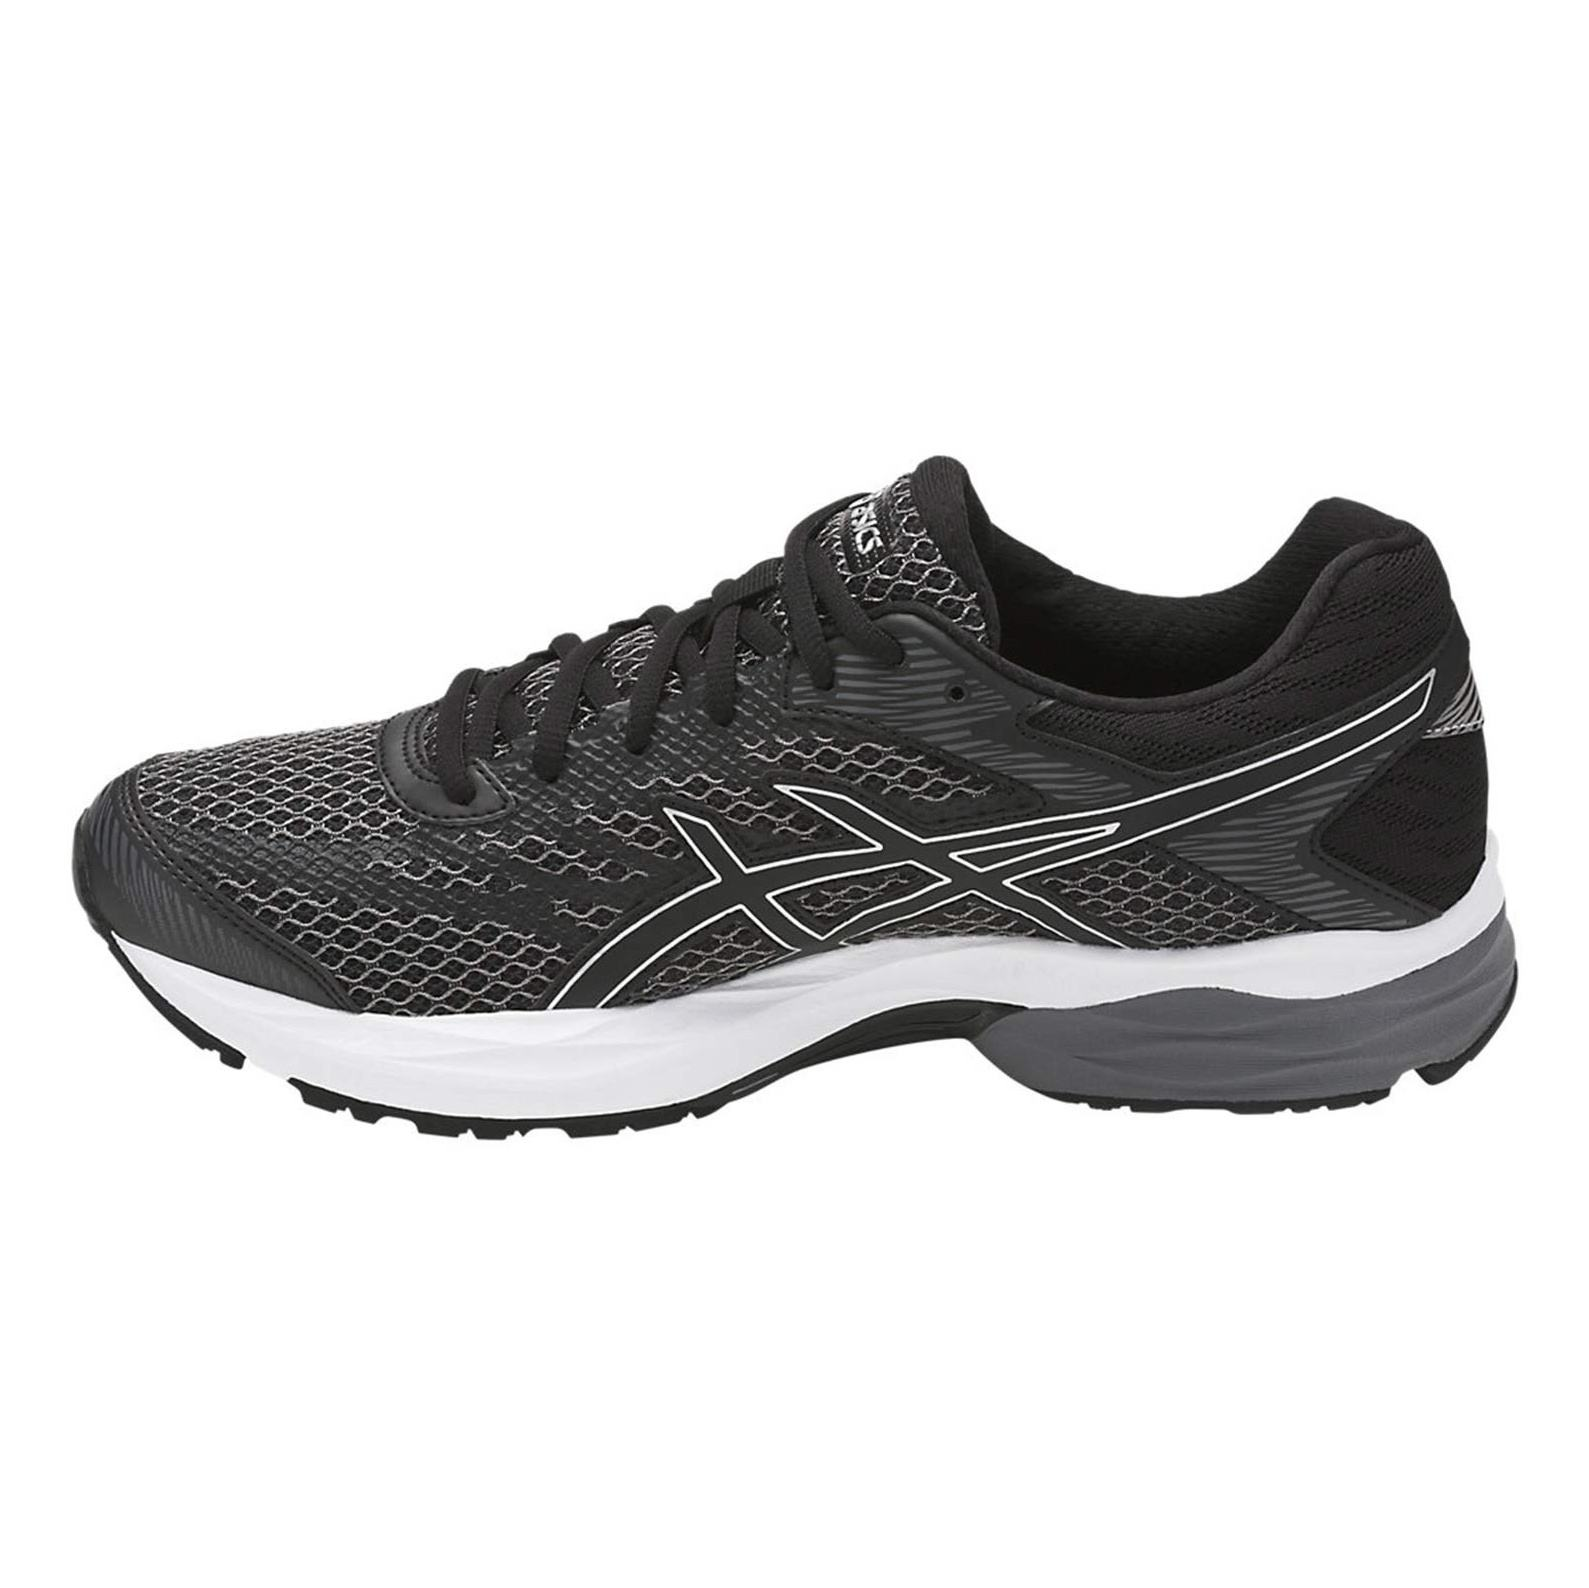 کفش دویدن بندی مردانه GEL-FLUX 4 - اسیکس - مشکي - 6